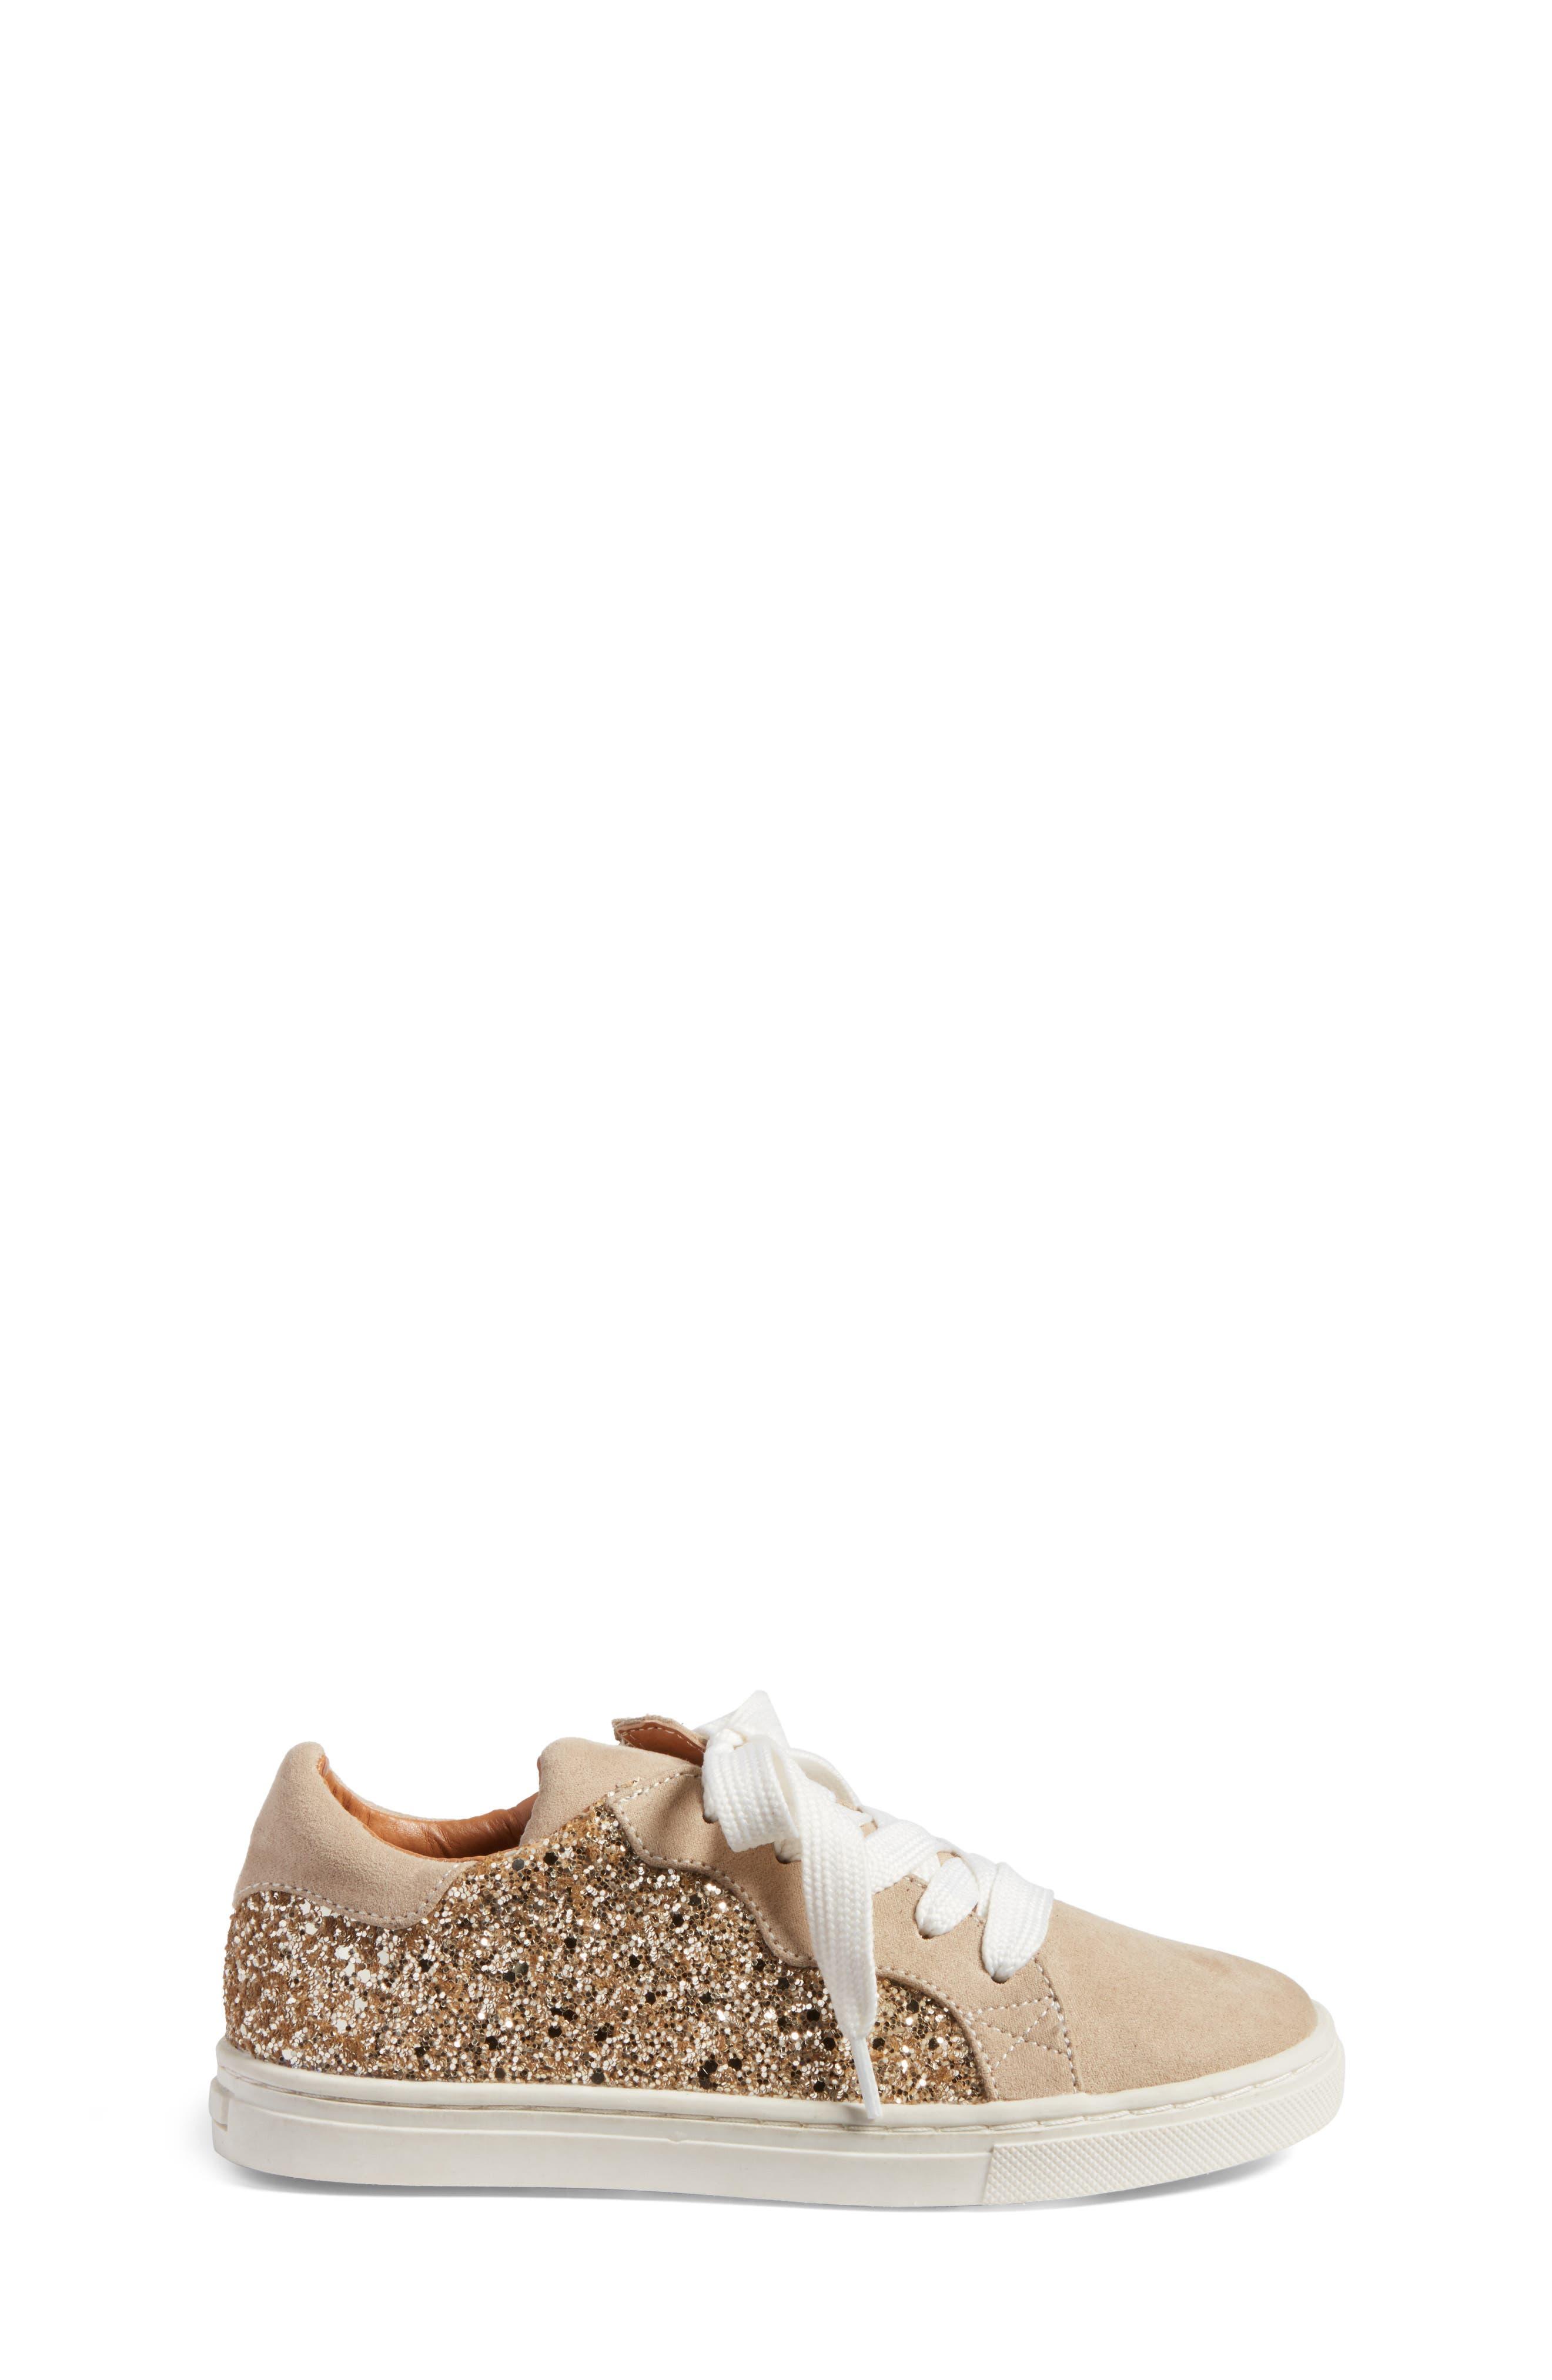 Zaida Low Top Sneaker,                             Alternate thumbnail 3, color,                             Gold Glitter